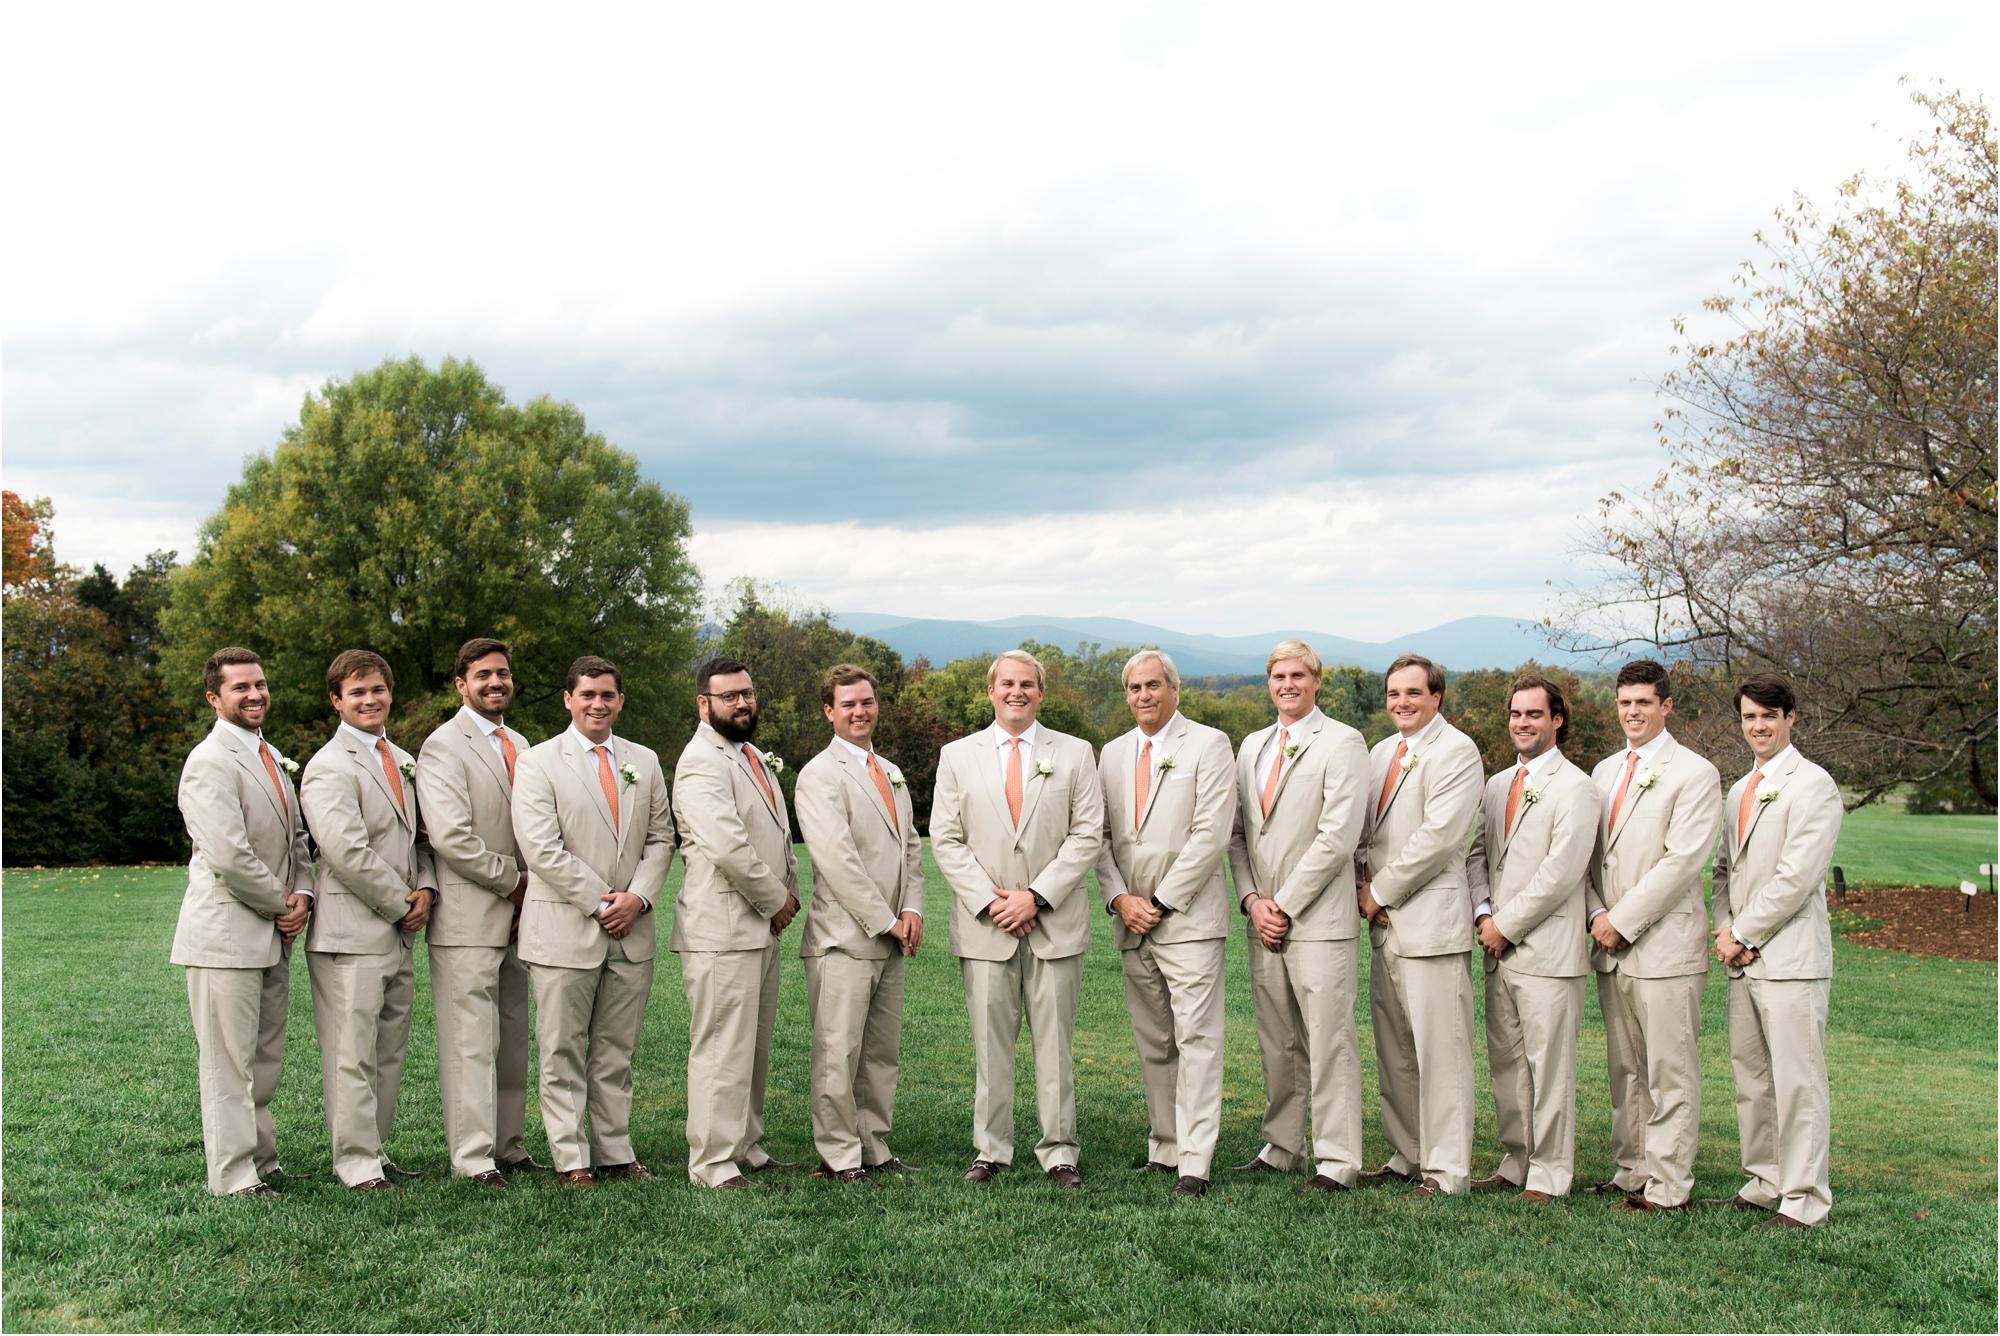 claire-thomas-farmington-country-club-charlottesville-virginia-wedding-photos_0016.jpg